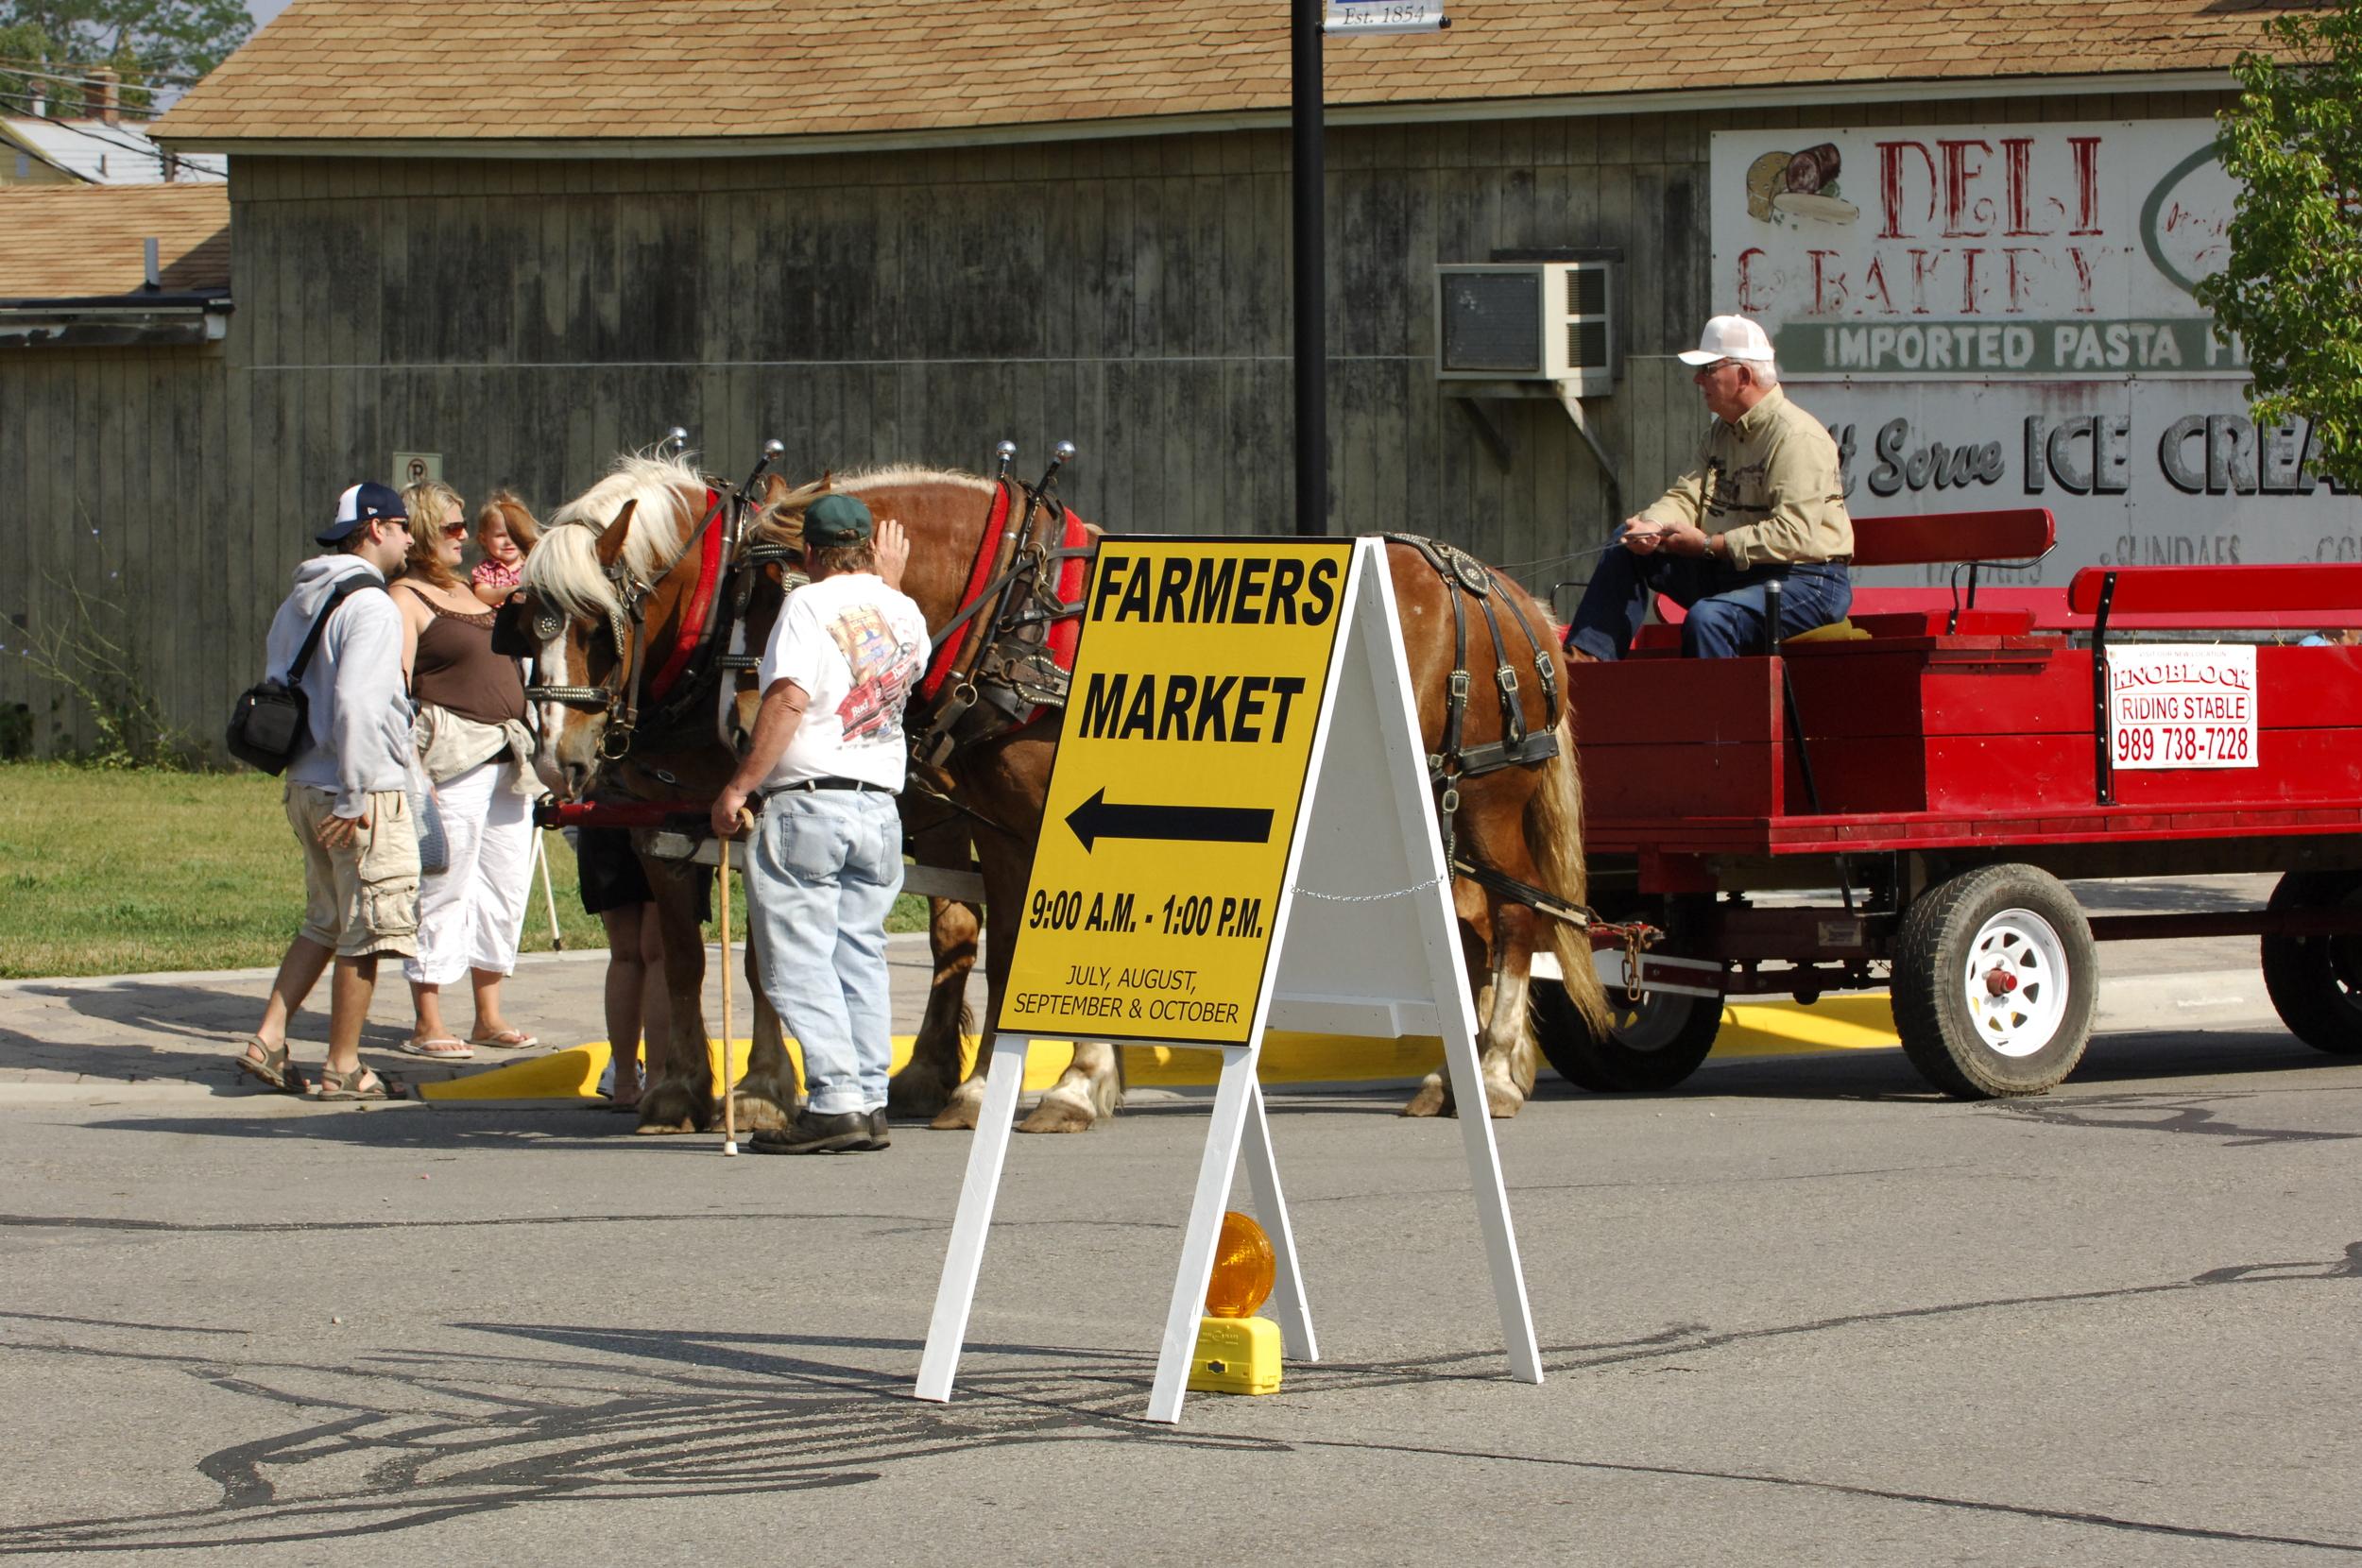 LIVEandCOMMUNITYandFARMMARKET Port Austin Farmers Market (2).JPG